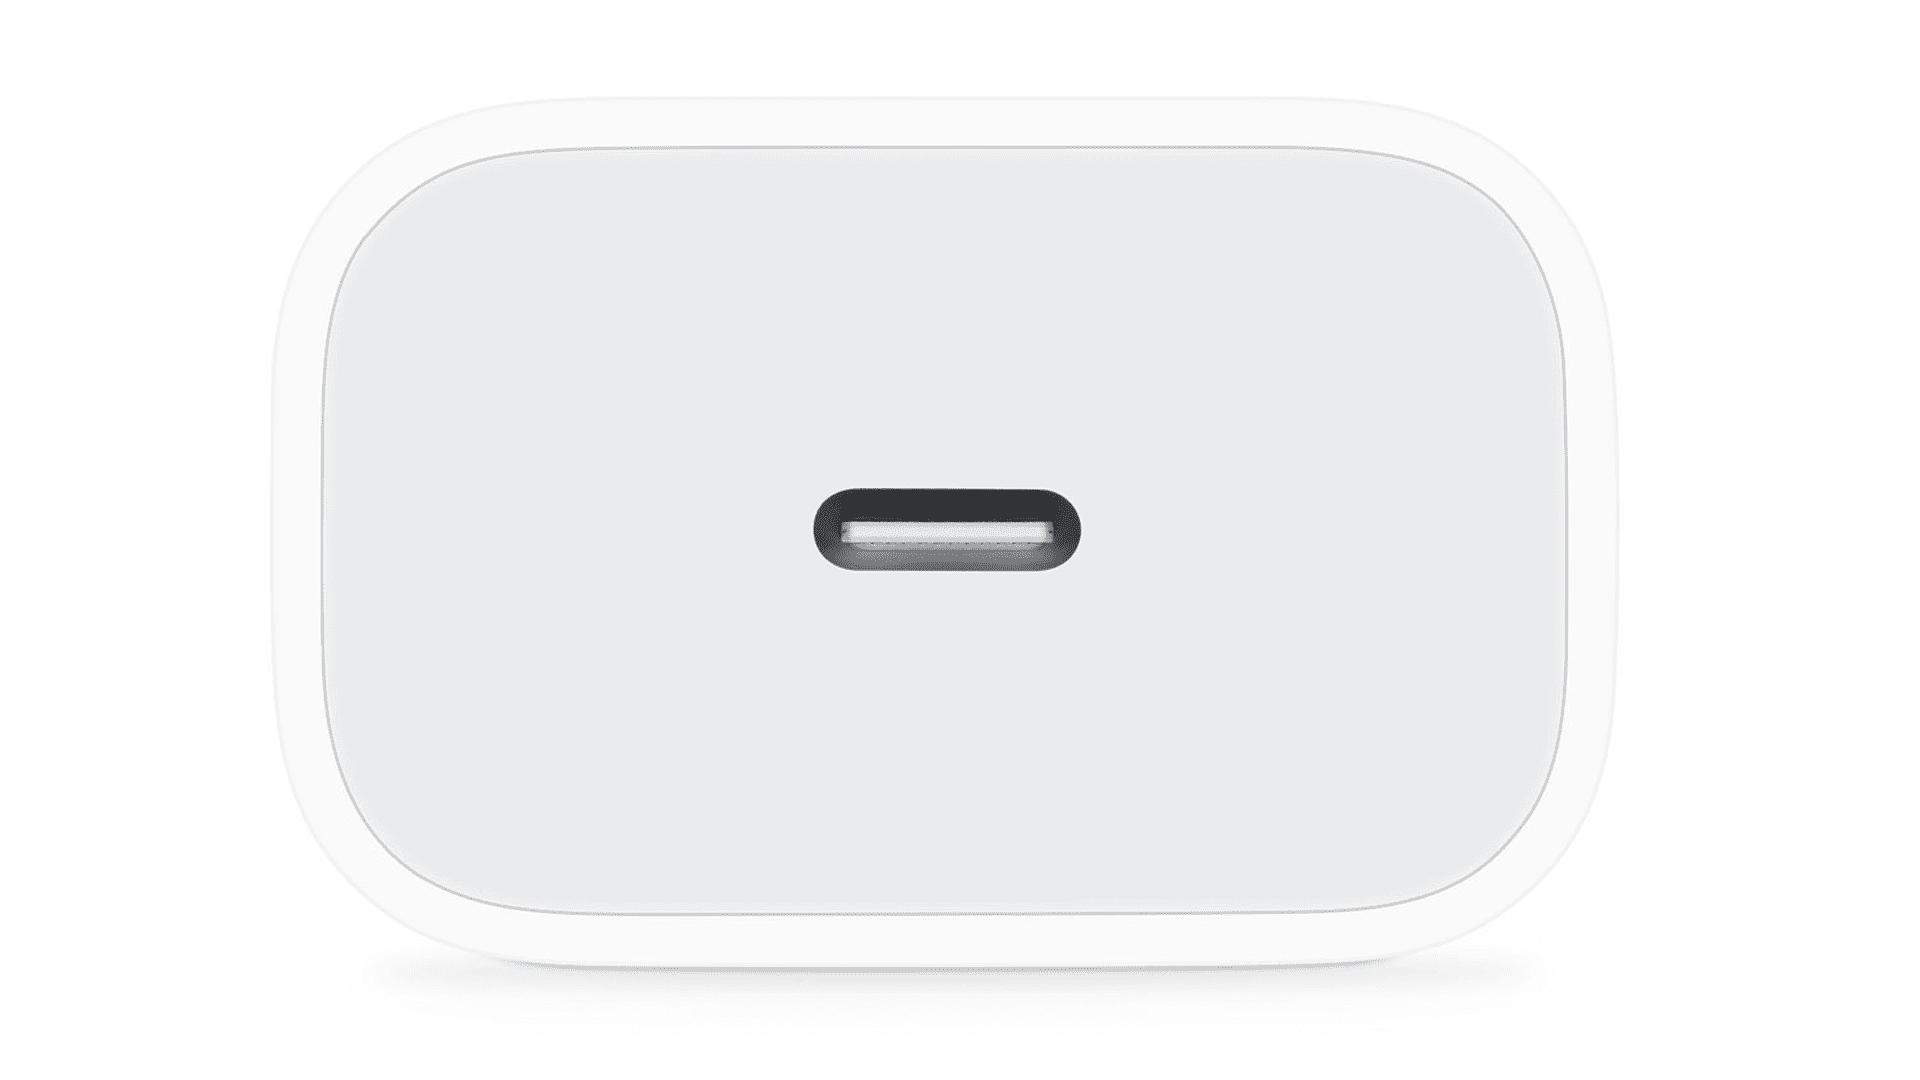 Apple's 20-watt iPhone charger.